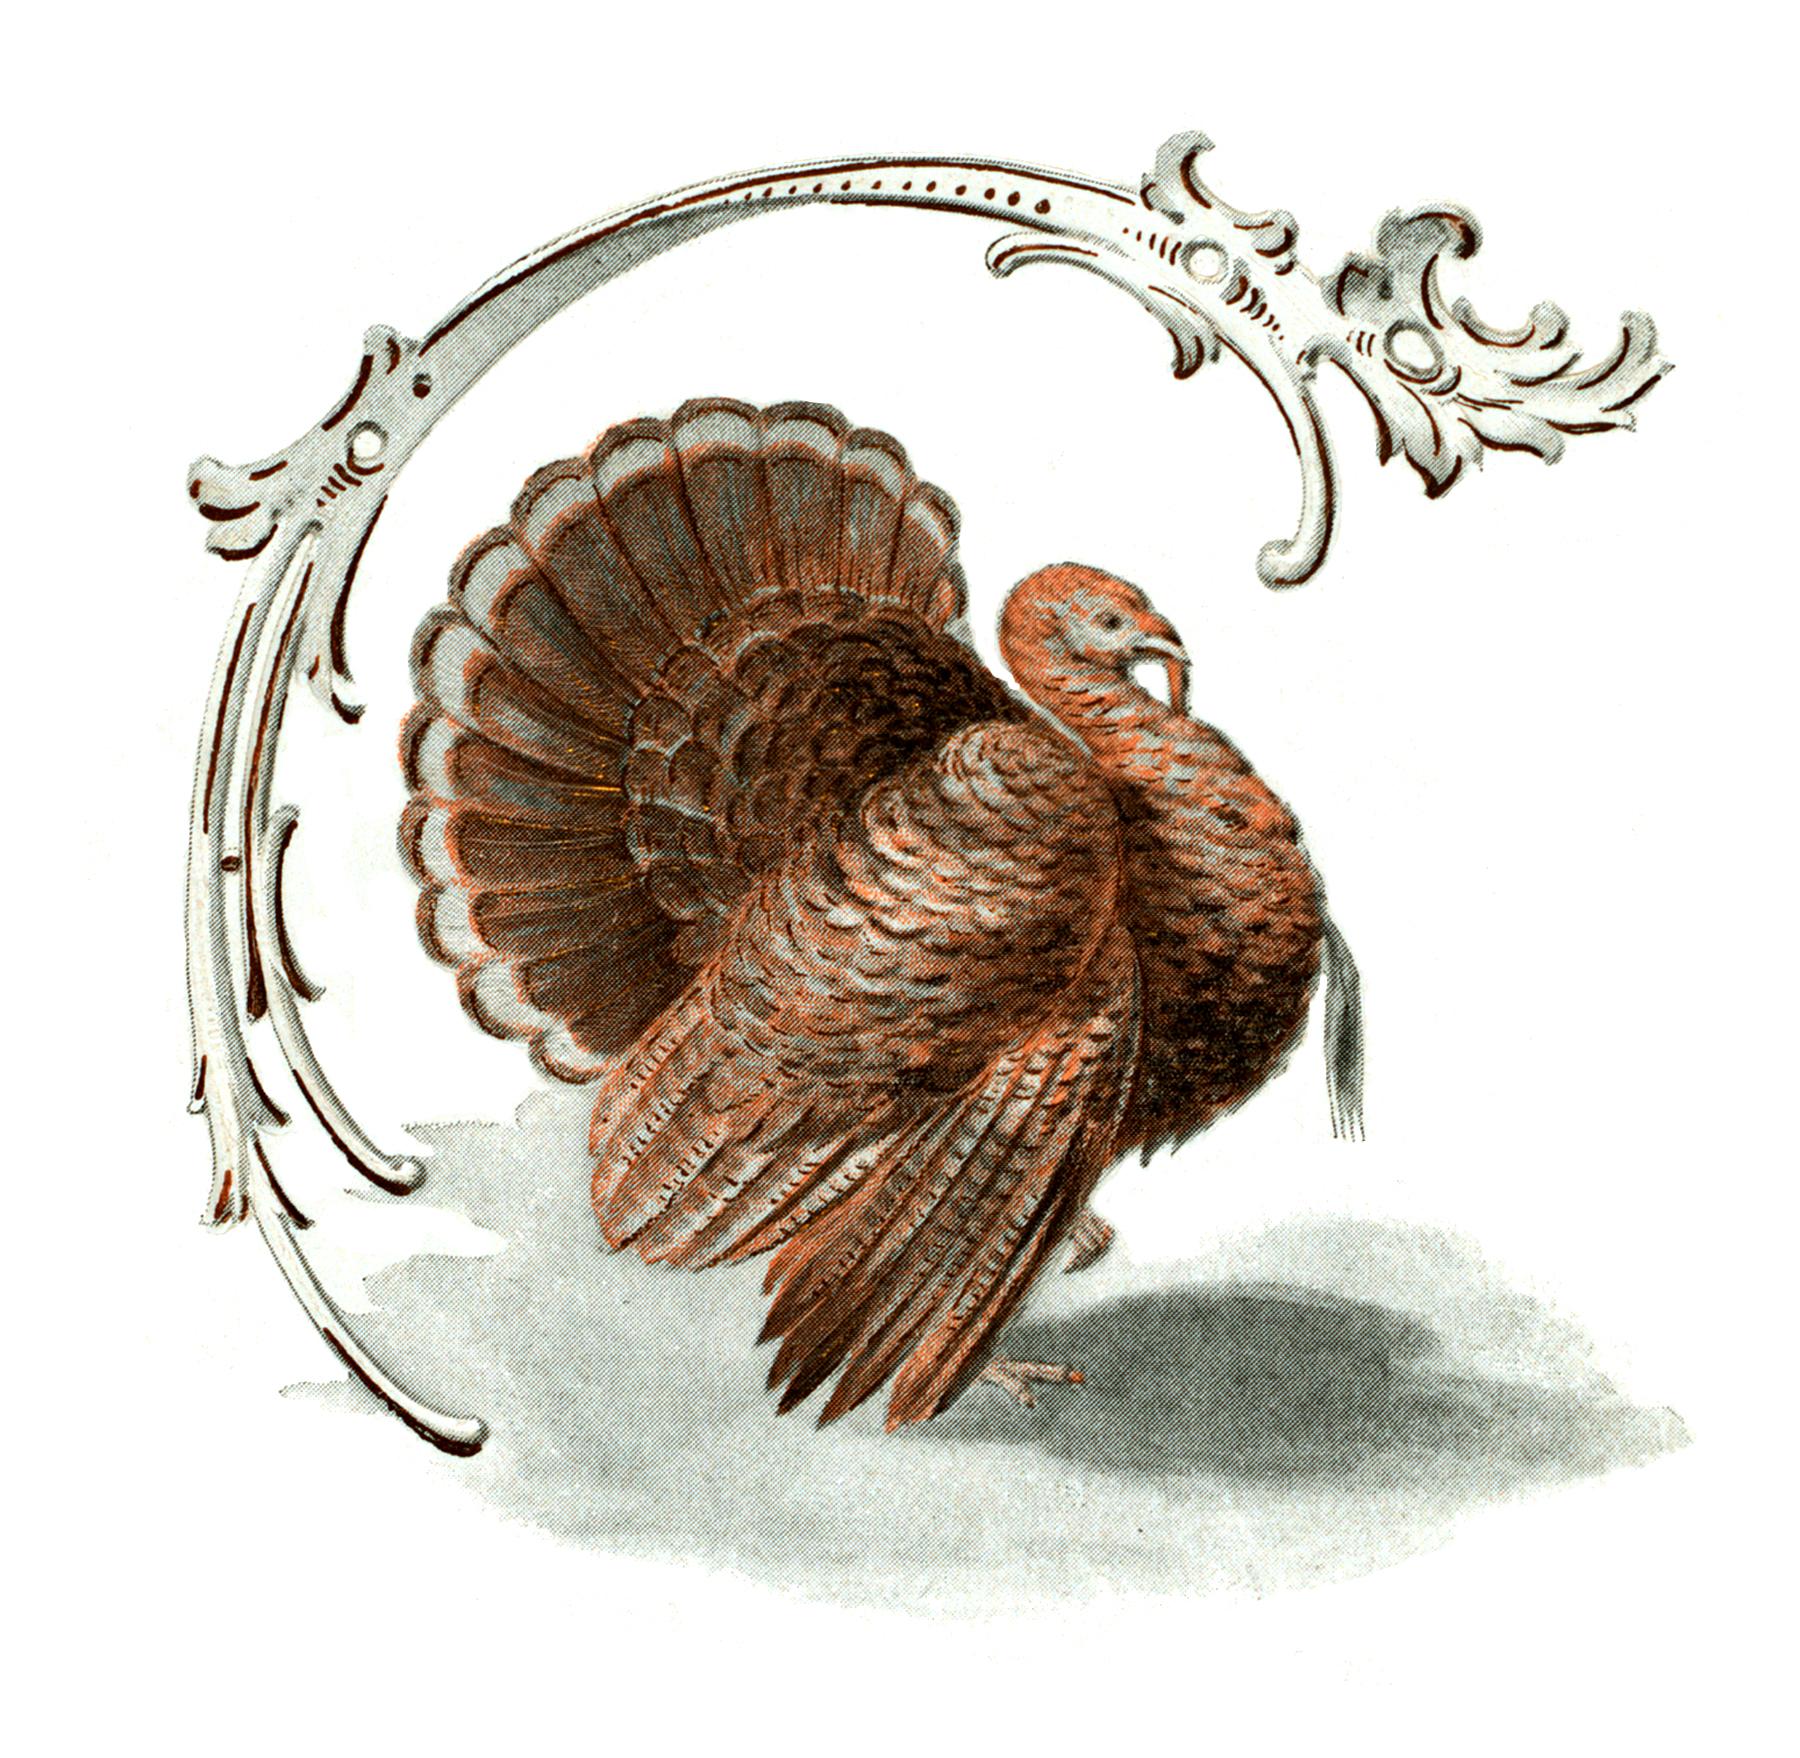 Public Domain Turkey Image